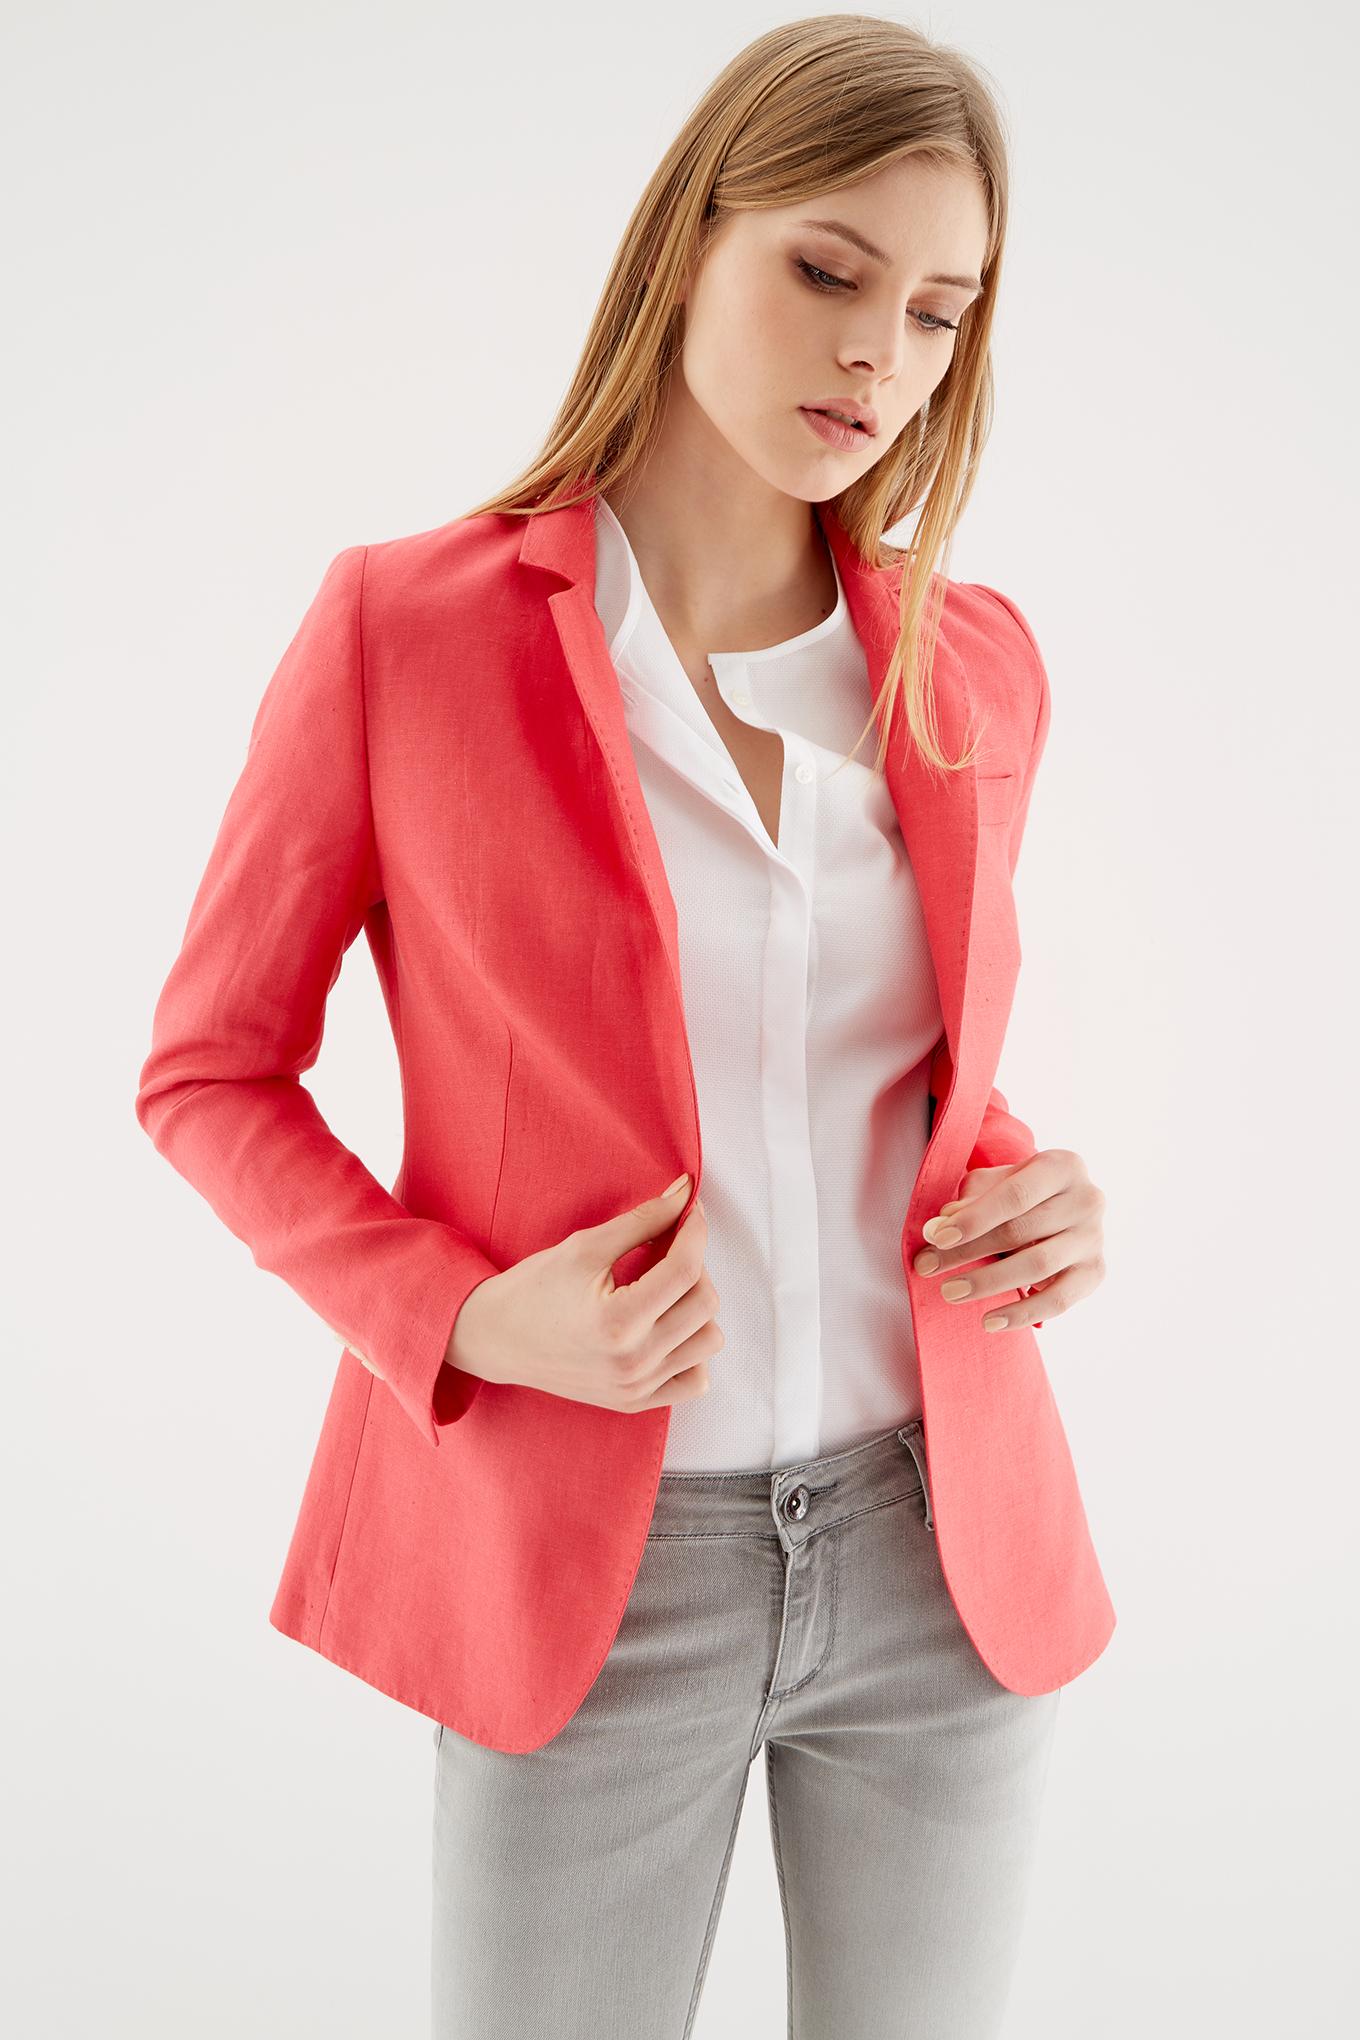 Blazer Pink Classic Woman